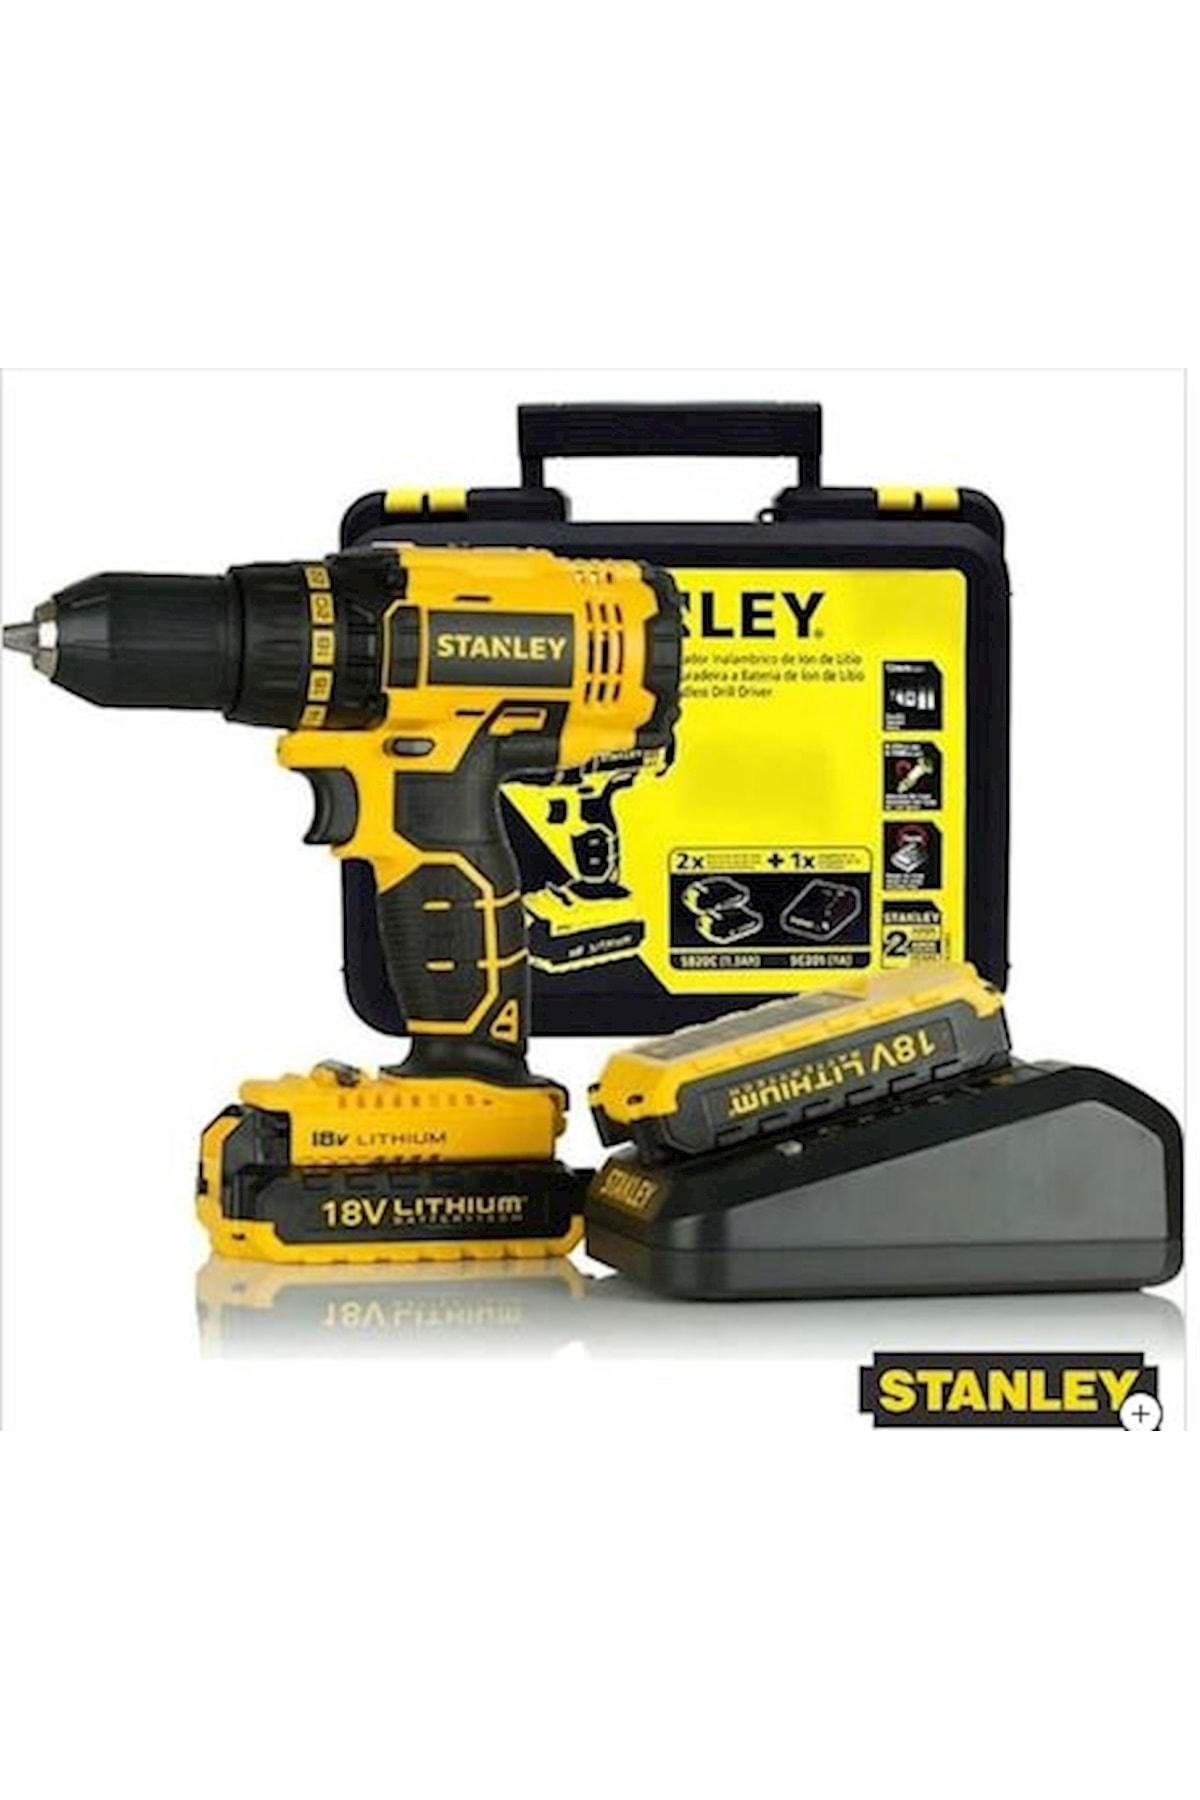 Stanley SCD201D2K 18 Volt 2 Ah Şarjlı Darbesiz Matkap Vidalama